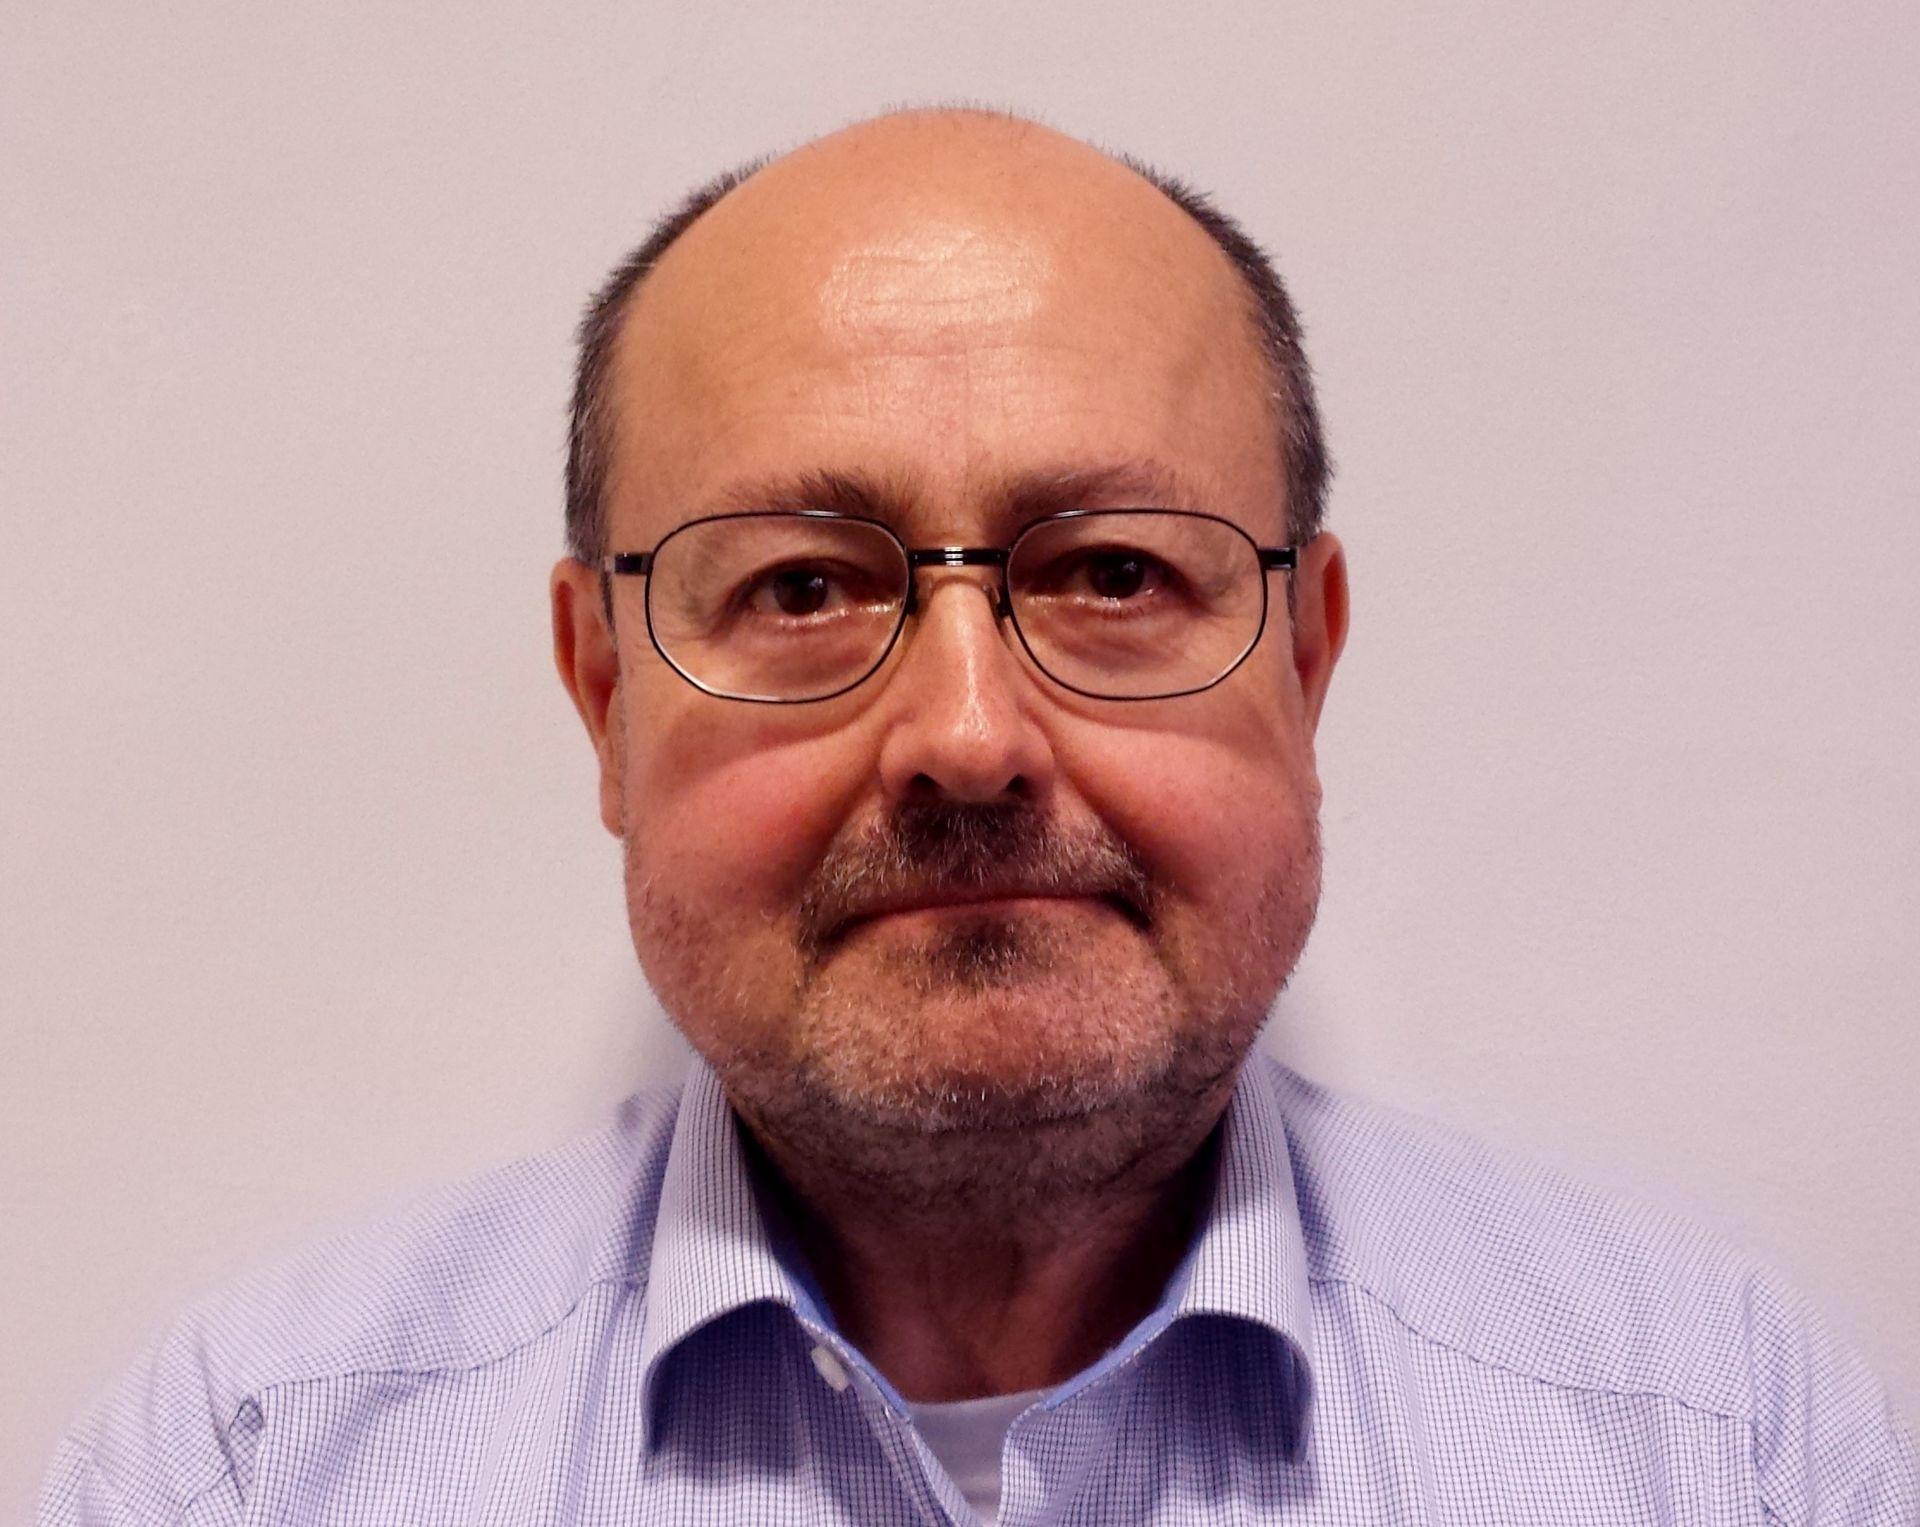 FOUNDATIONS OF BIOPHILOSOPHY - Martin Mahner,Mario Bunge